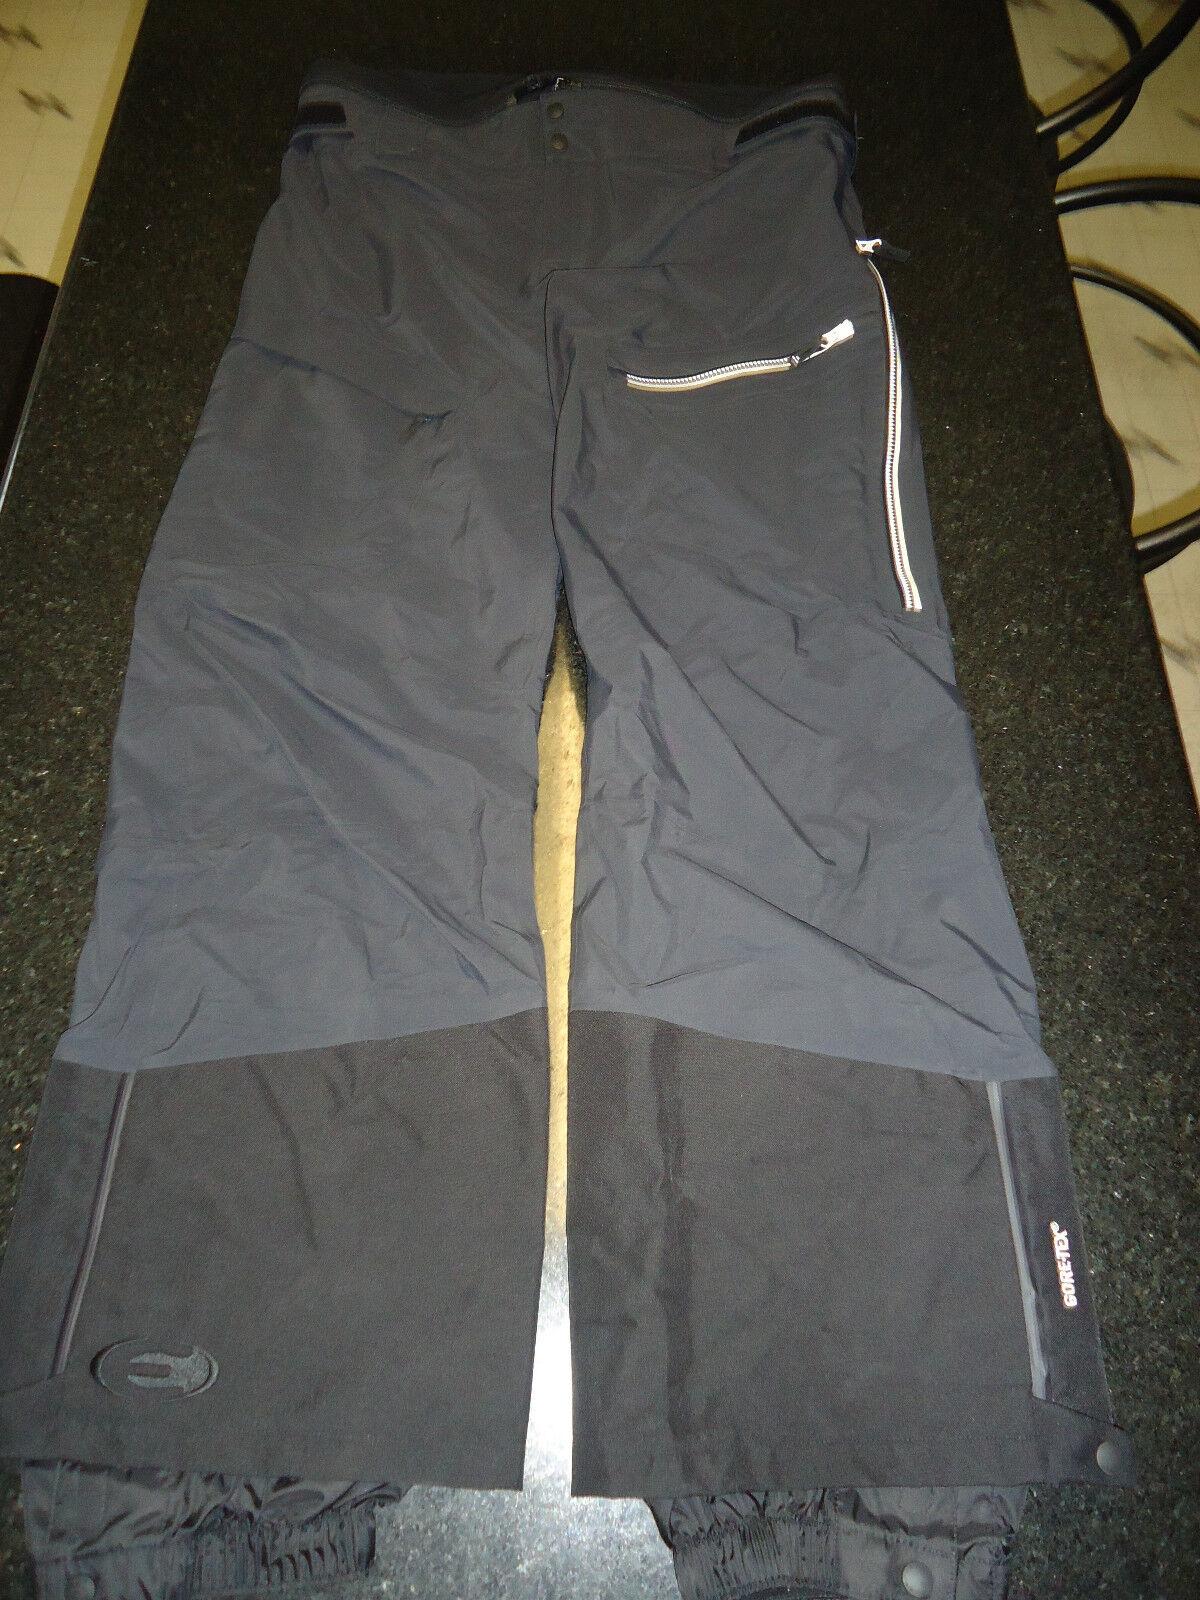 EIDER SPENCER GTX GORE-TEX C-KNIT BIB PANTS MEN'S X-LARGE (XL) SRP -